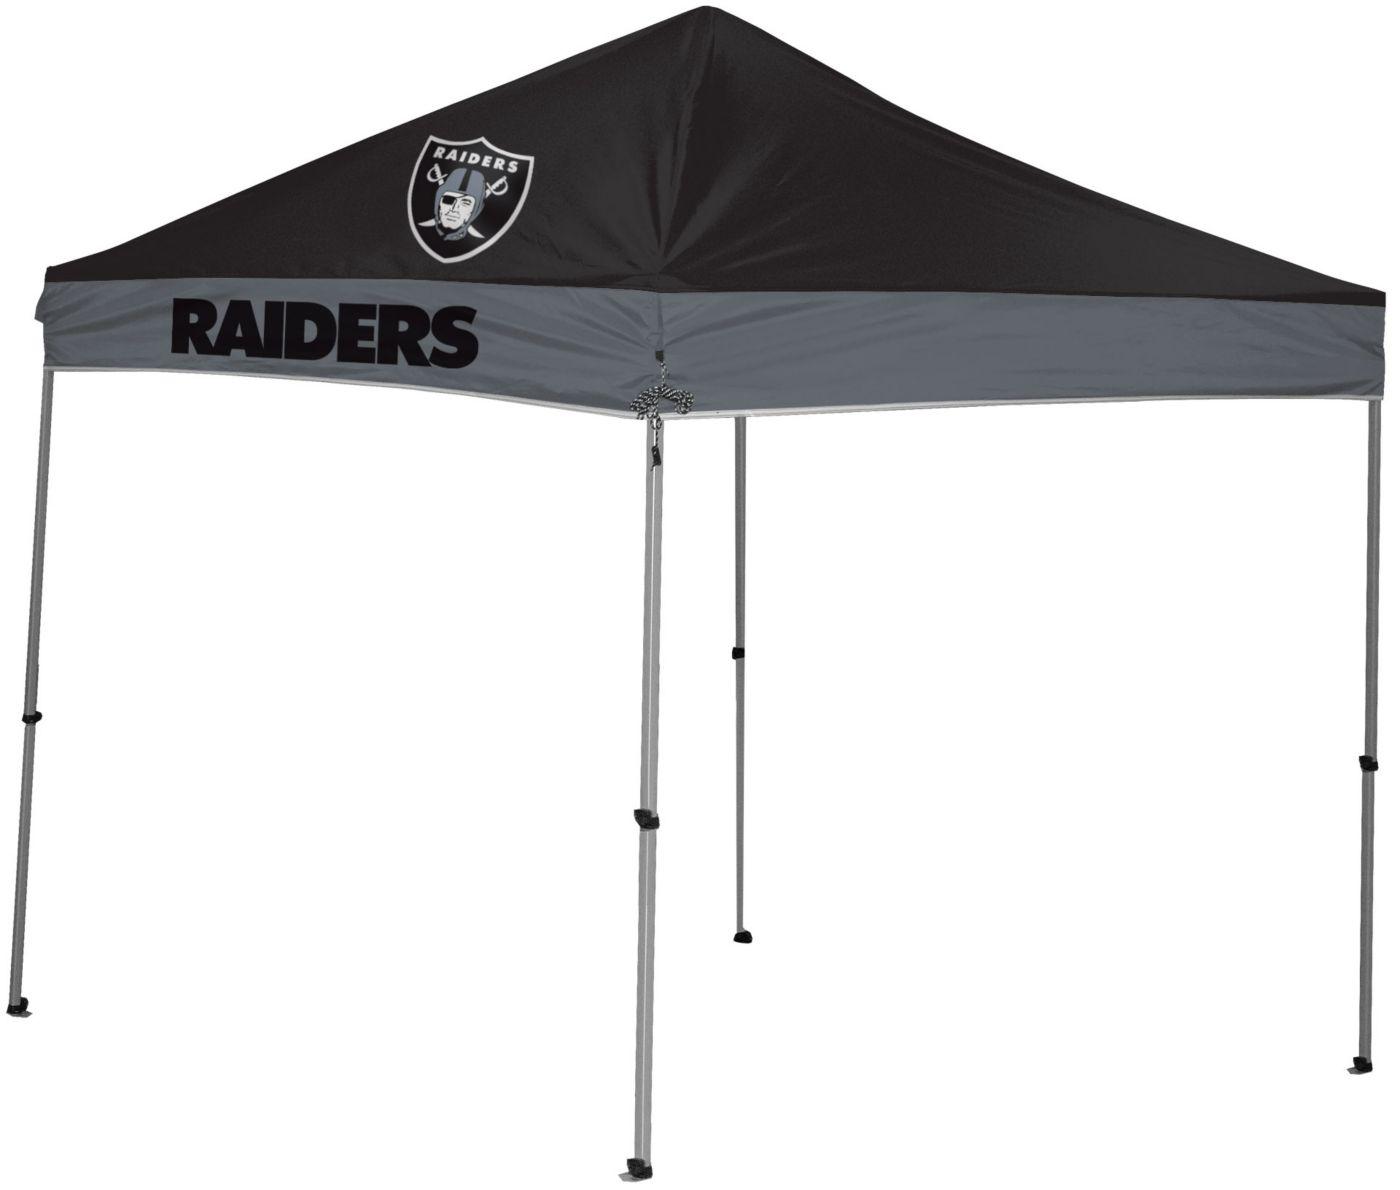 Rawlings Oakland Raiders 9' x 9' Sideline Canopy Tent